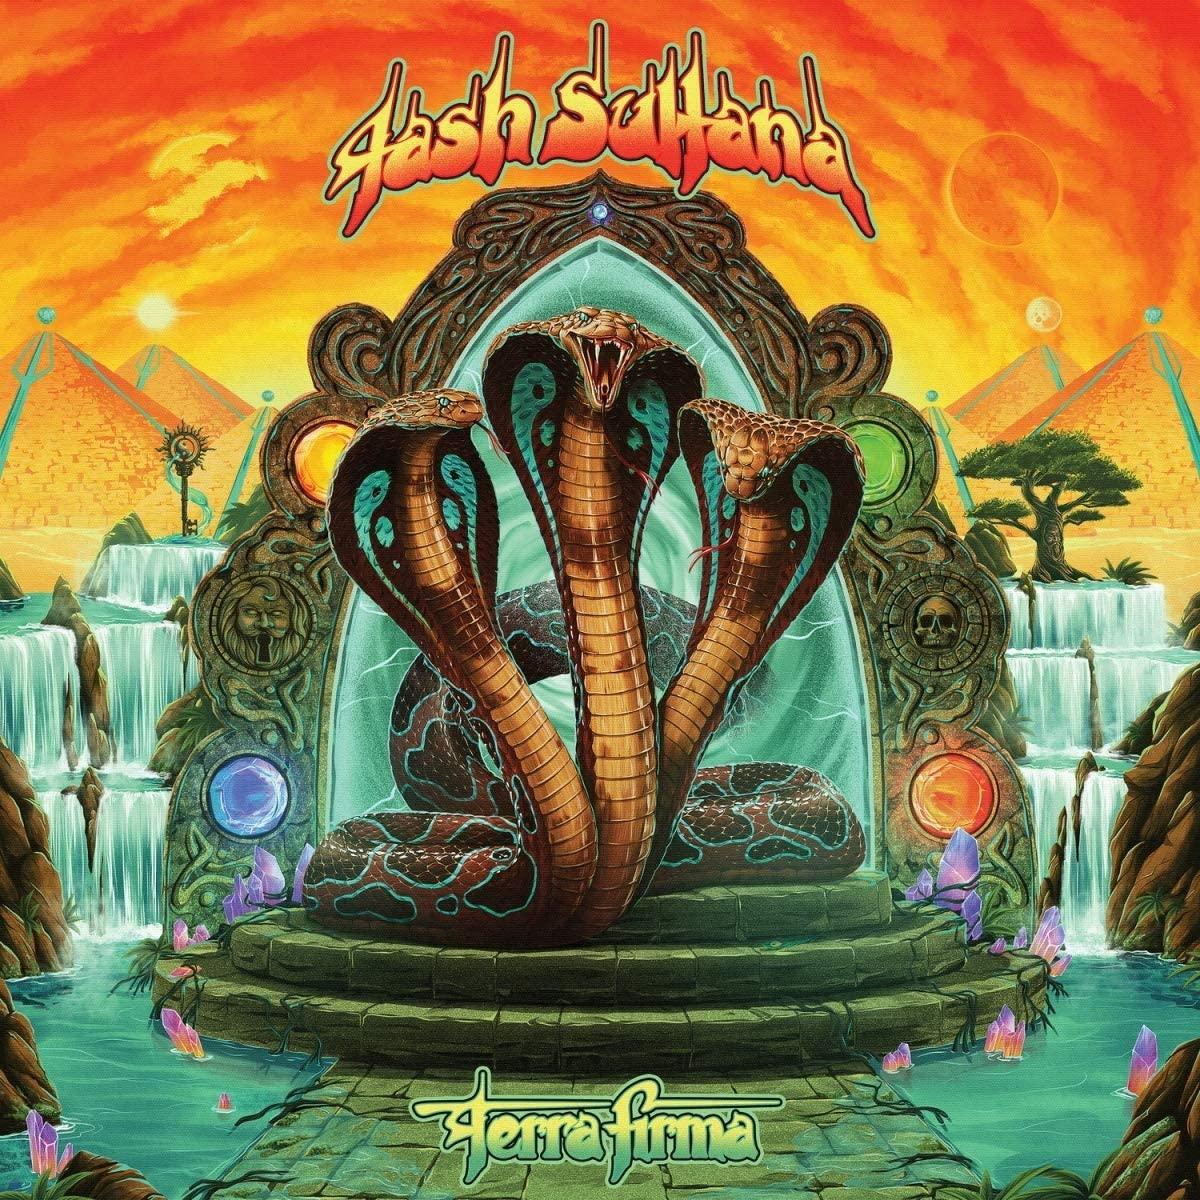 TASH SULTANA - TERRA FIRMA (CD)